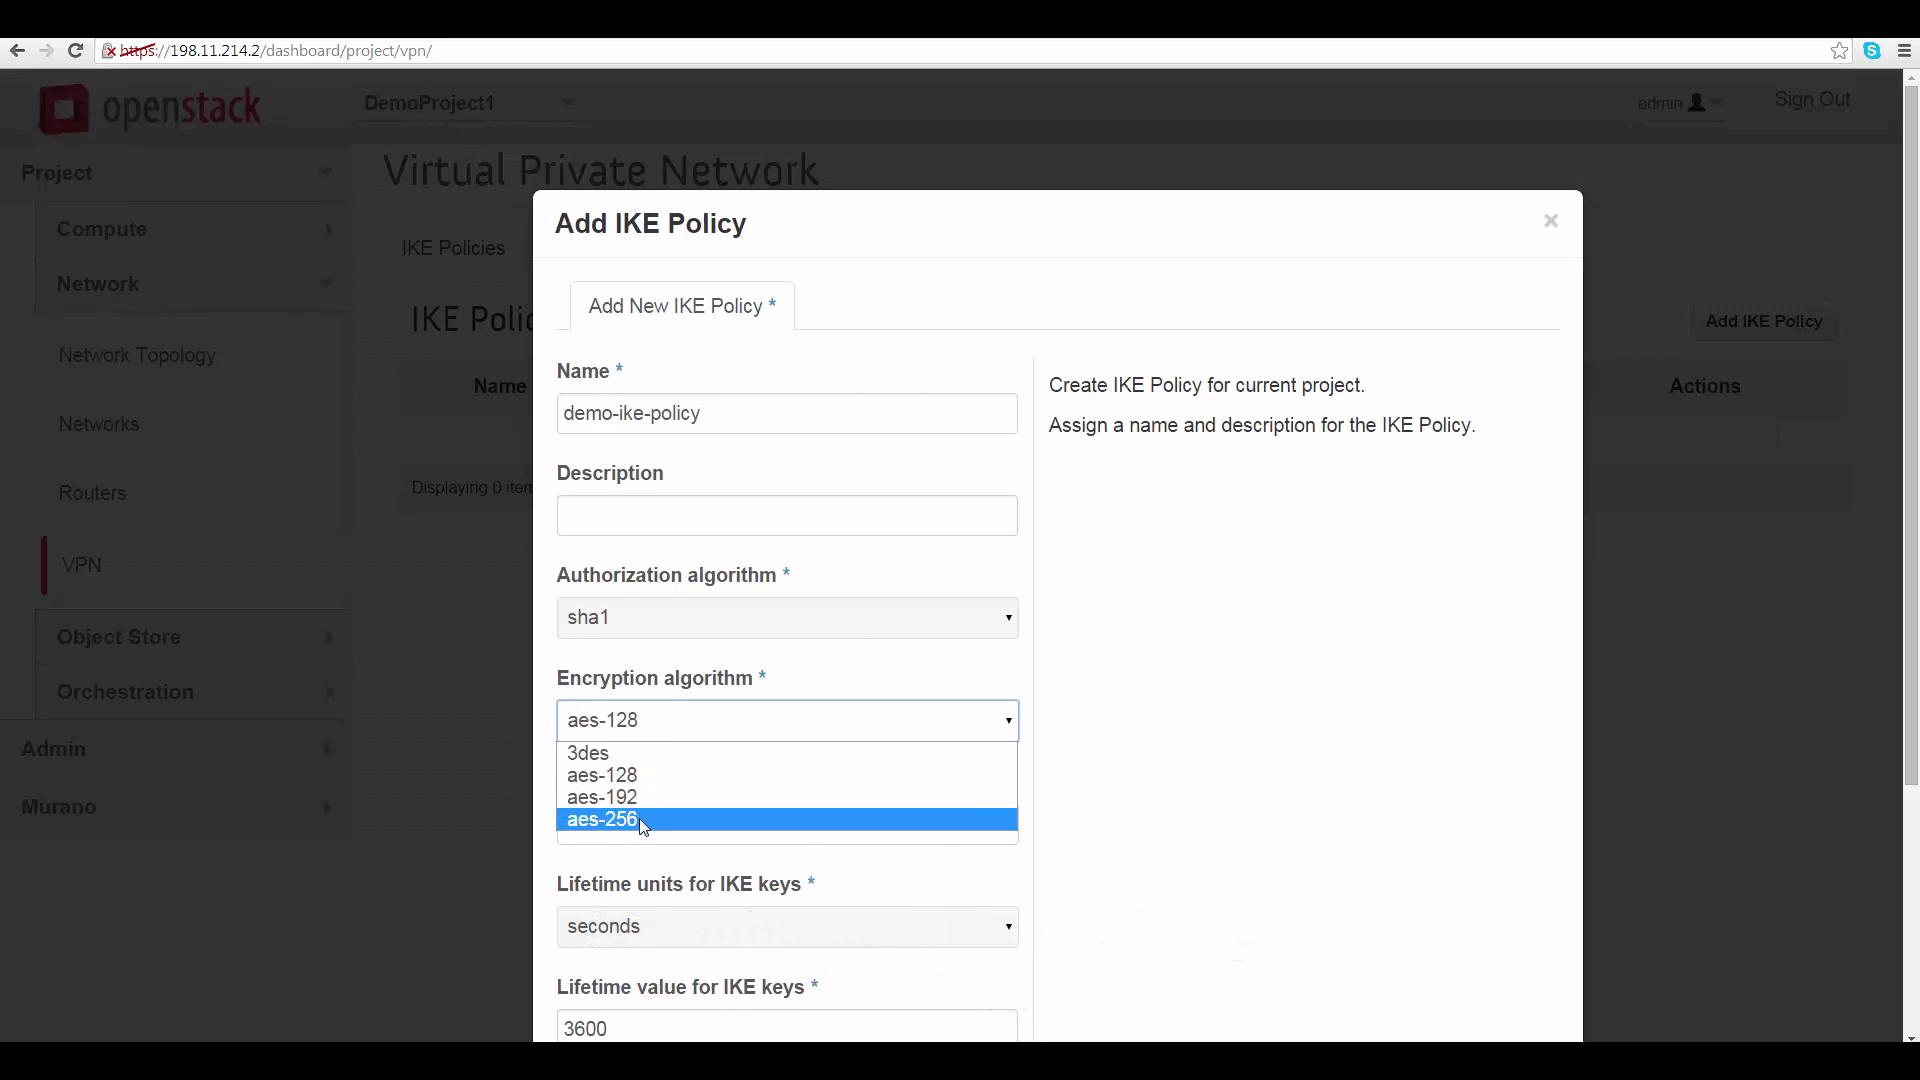 screenshot of Add IKE Policy window in the Mirantis OpenStack Express dashboard